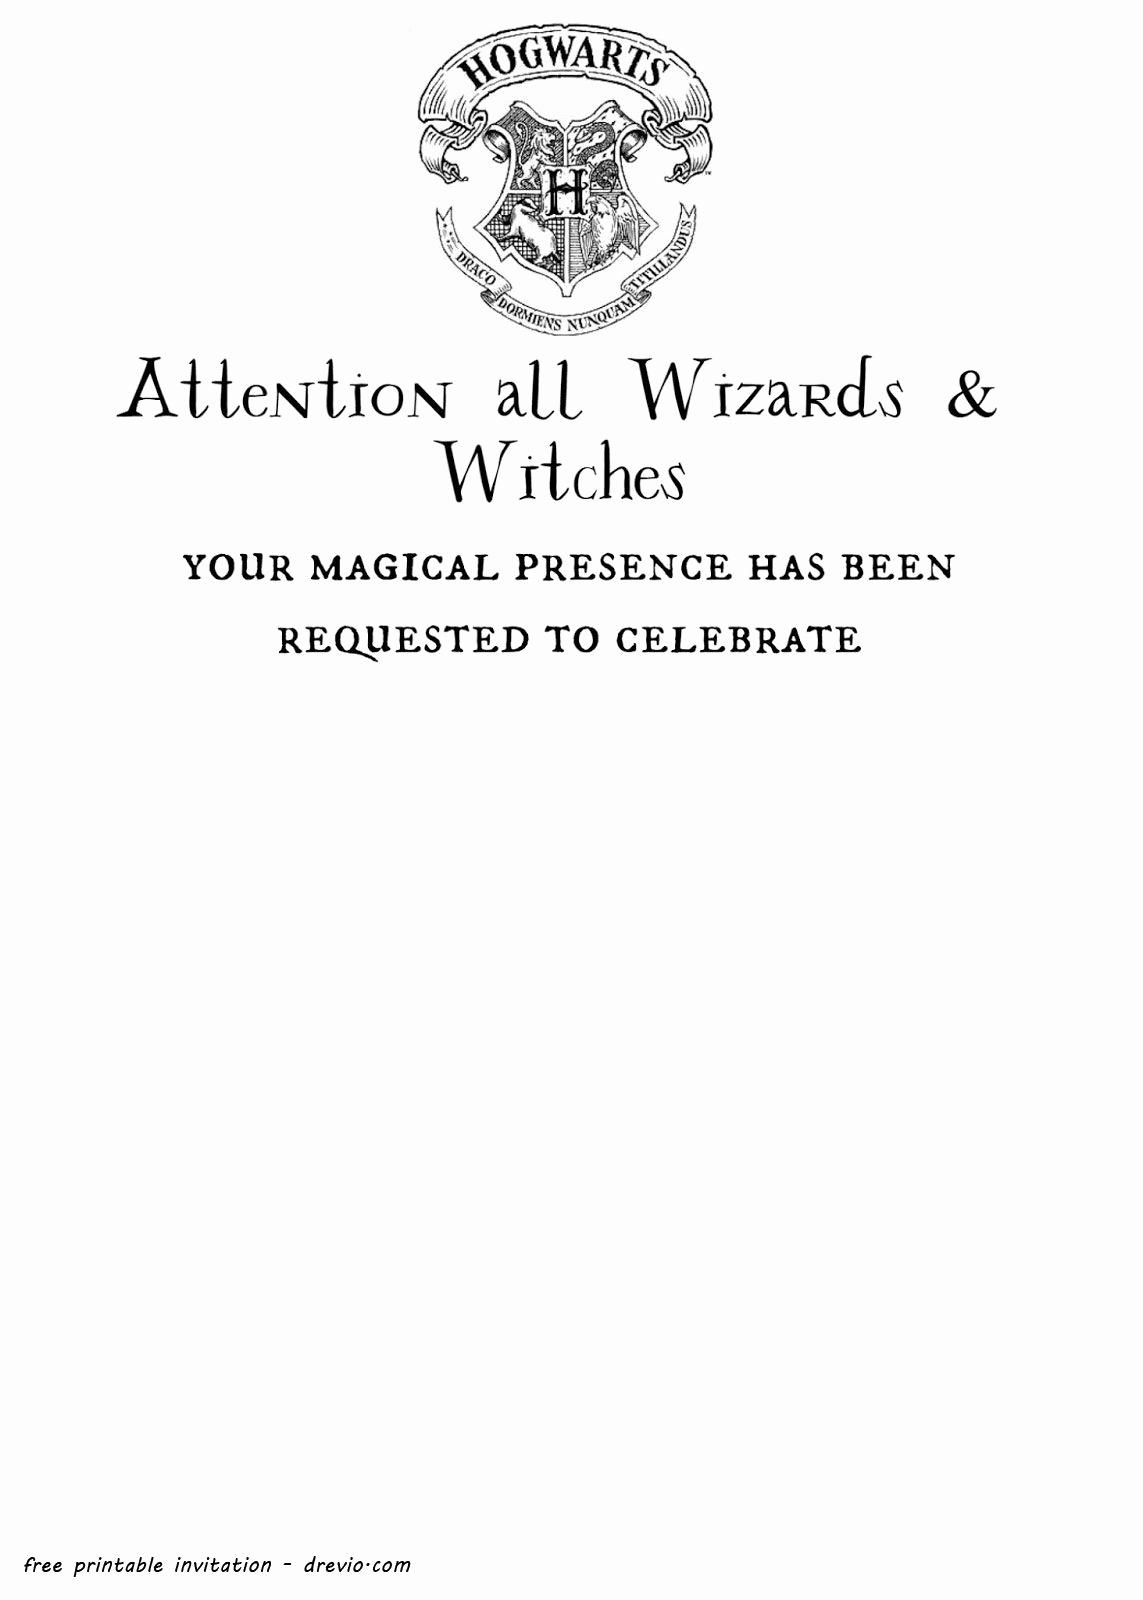 Harry Potter Invitation Template Free Beautiful 13 Harry Potter Invitations Printable